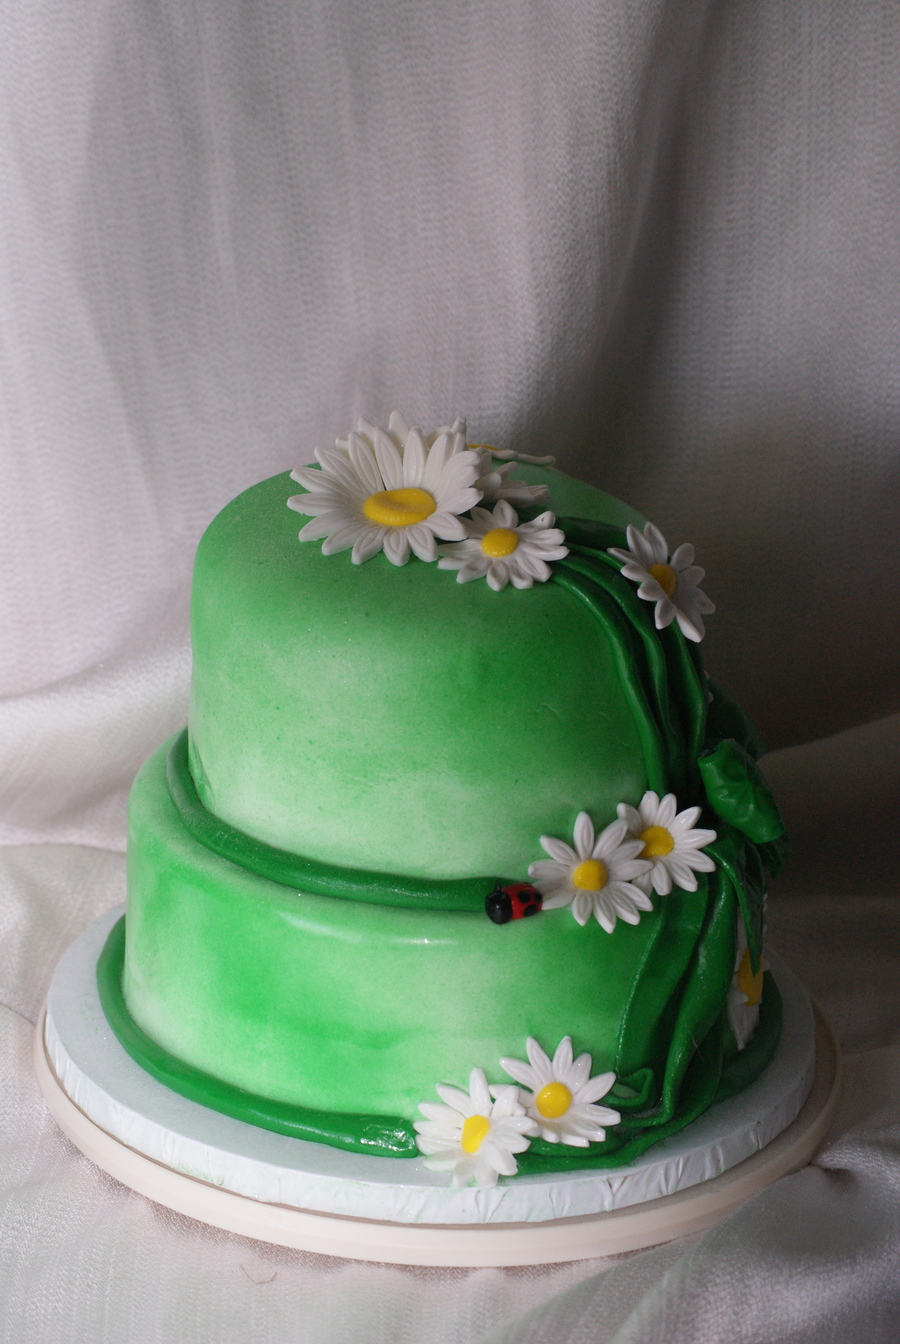 Marvelous Daisy Birthday Cakecentral Com Funny Birthday Cards Online Alyptdamsfinfo